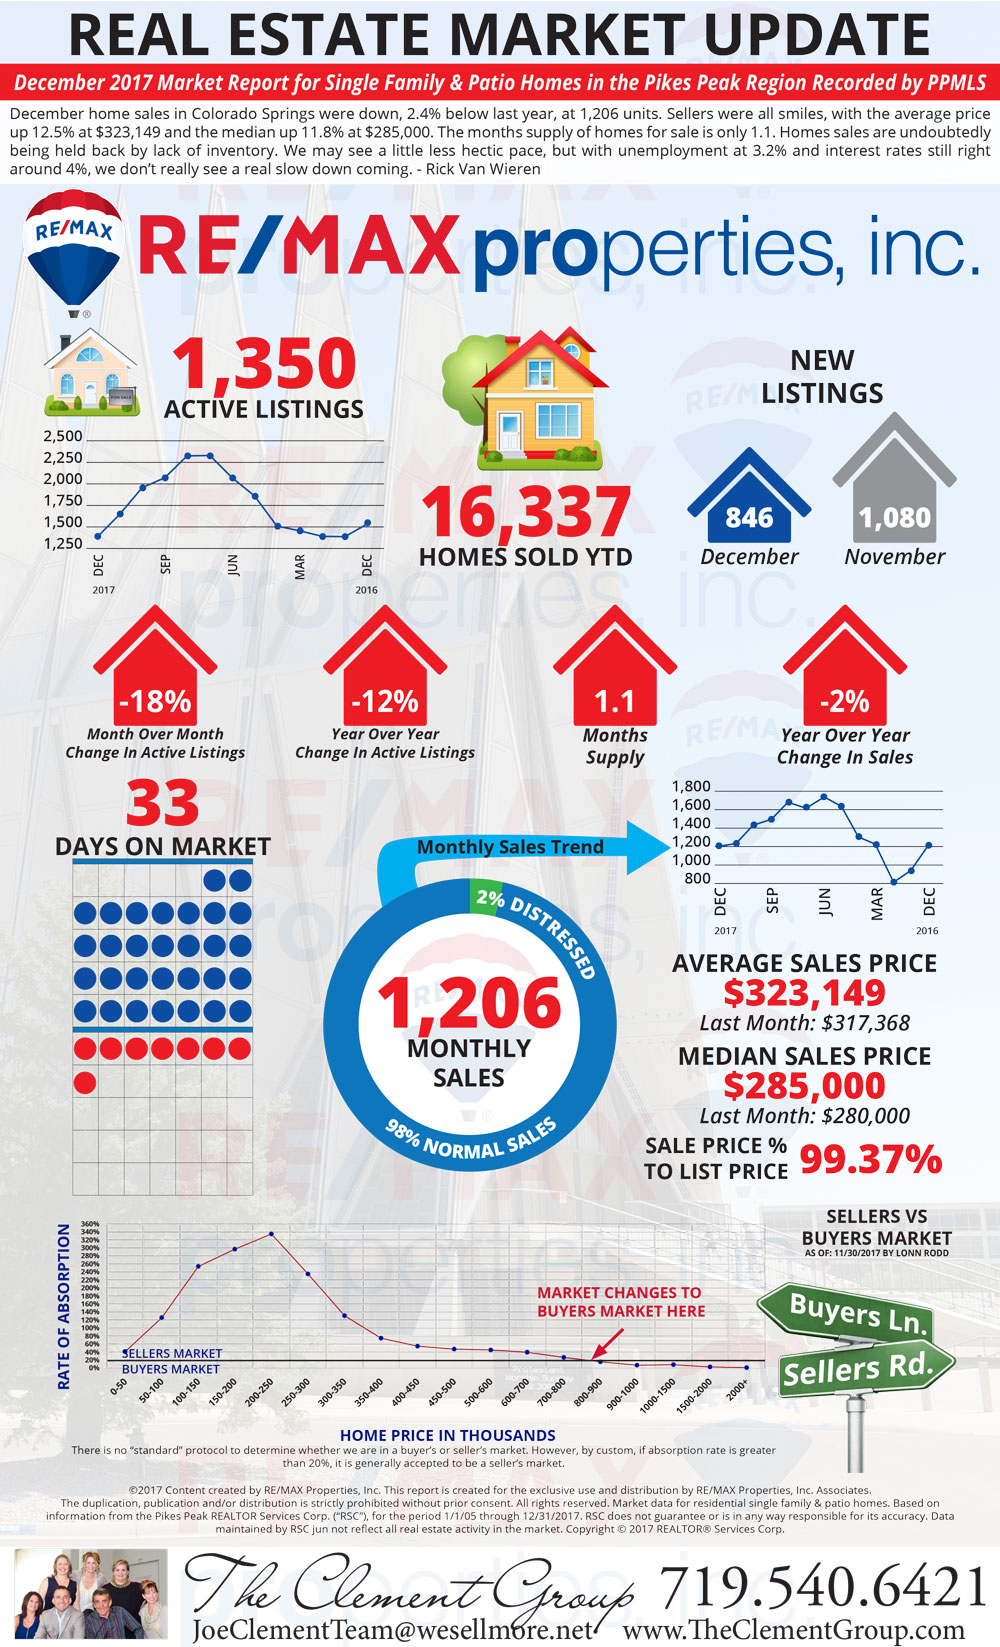 December 2017 Market Update - Colorado Springs Real Estate